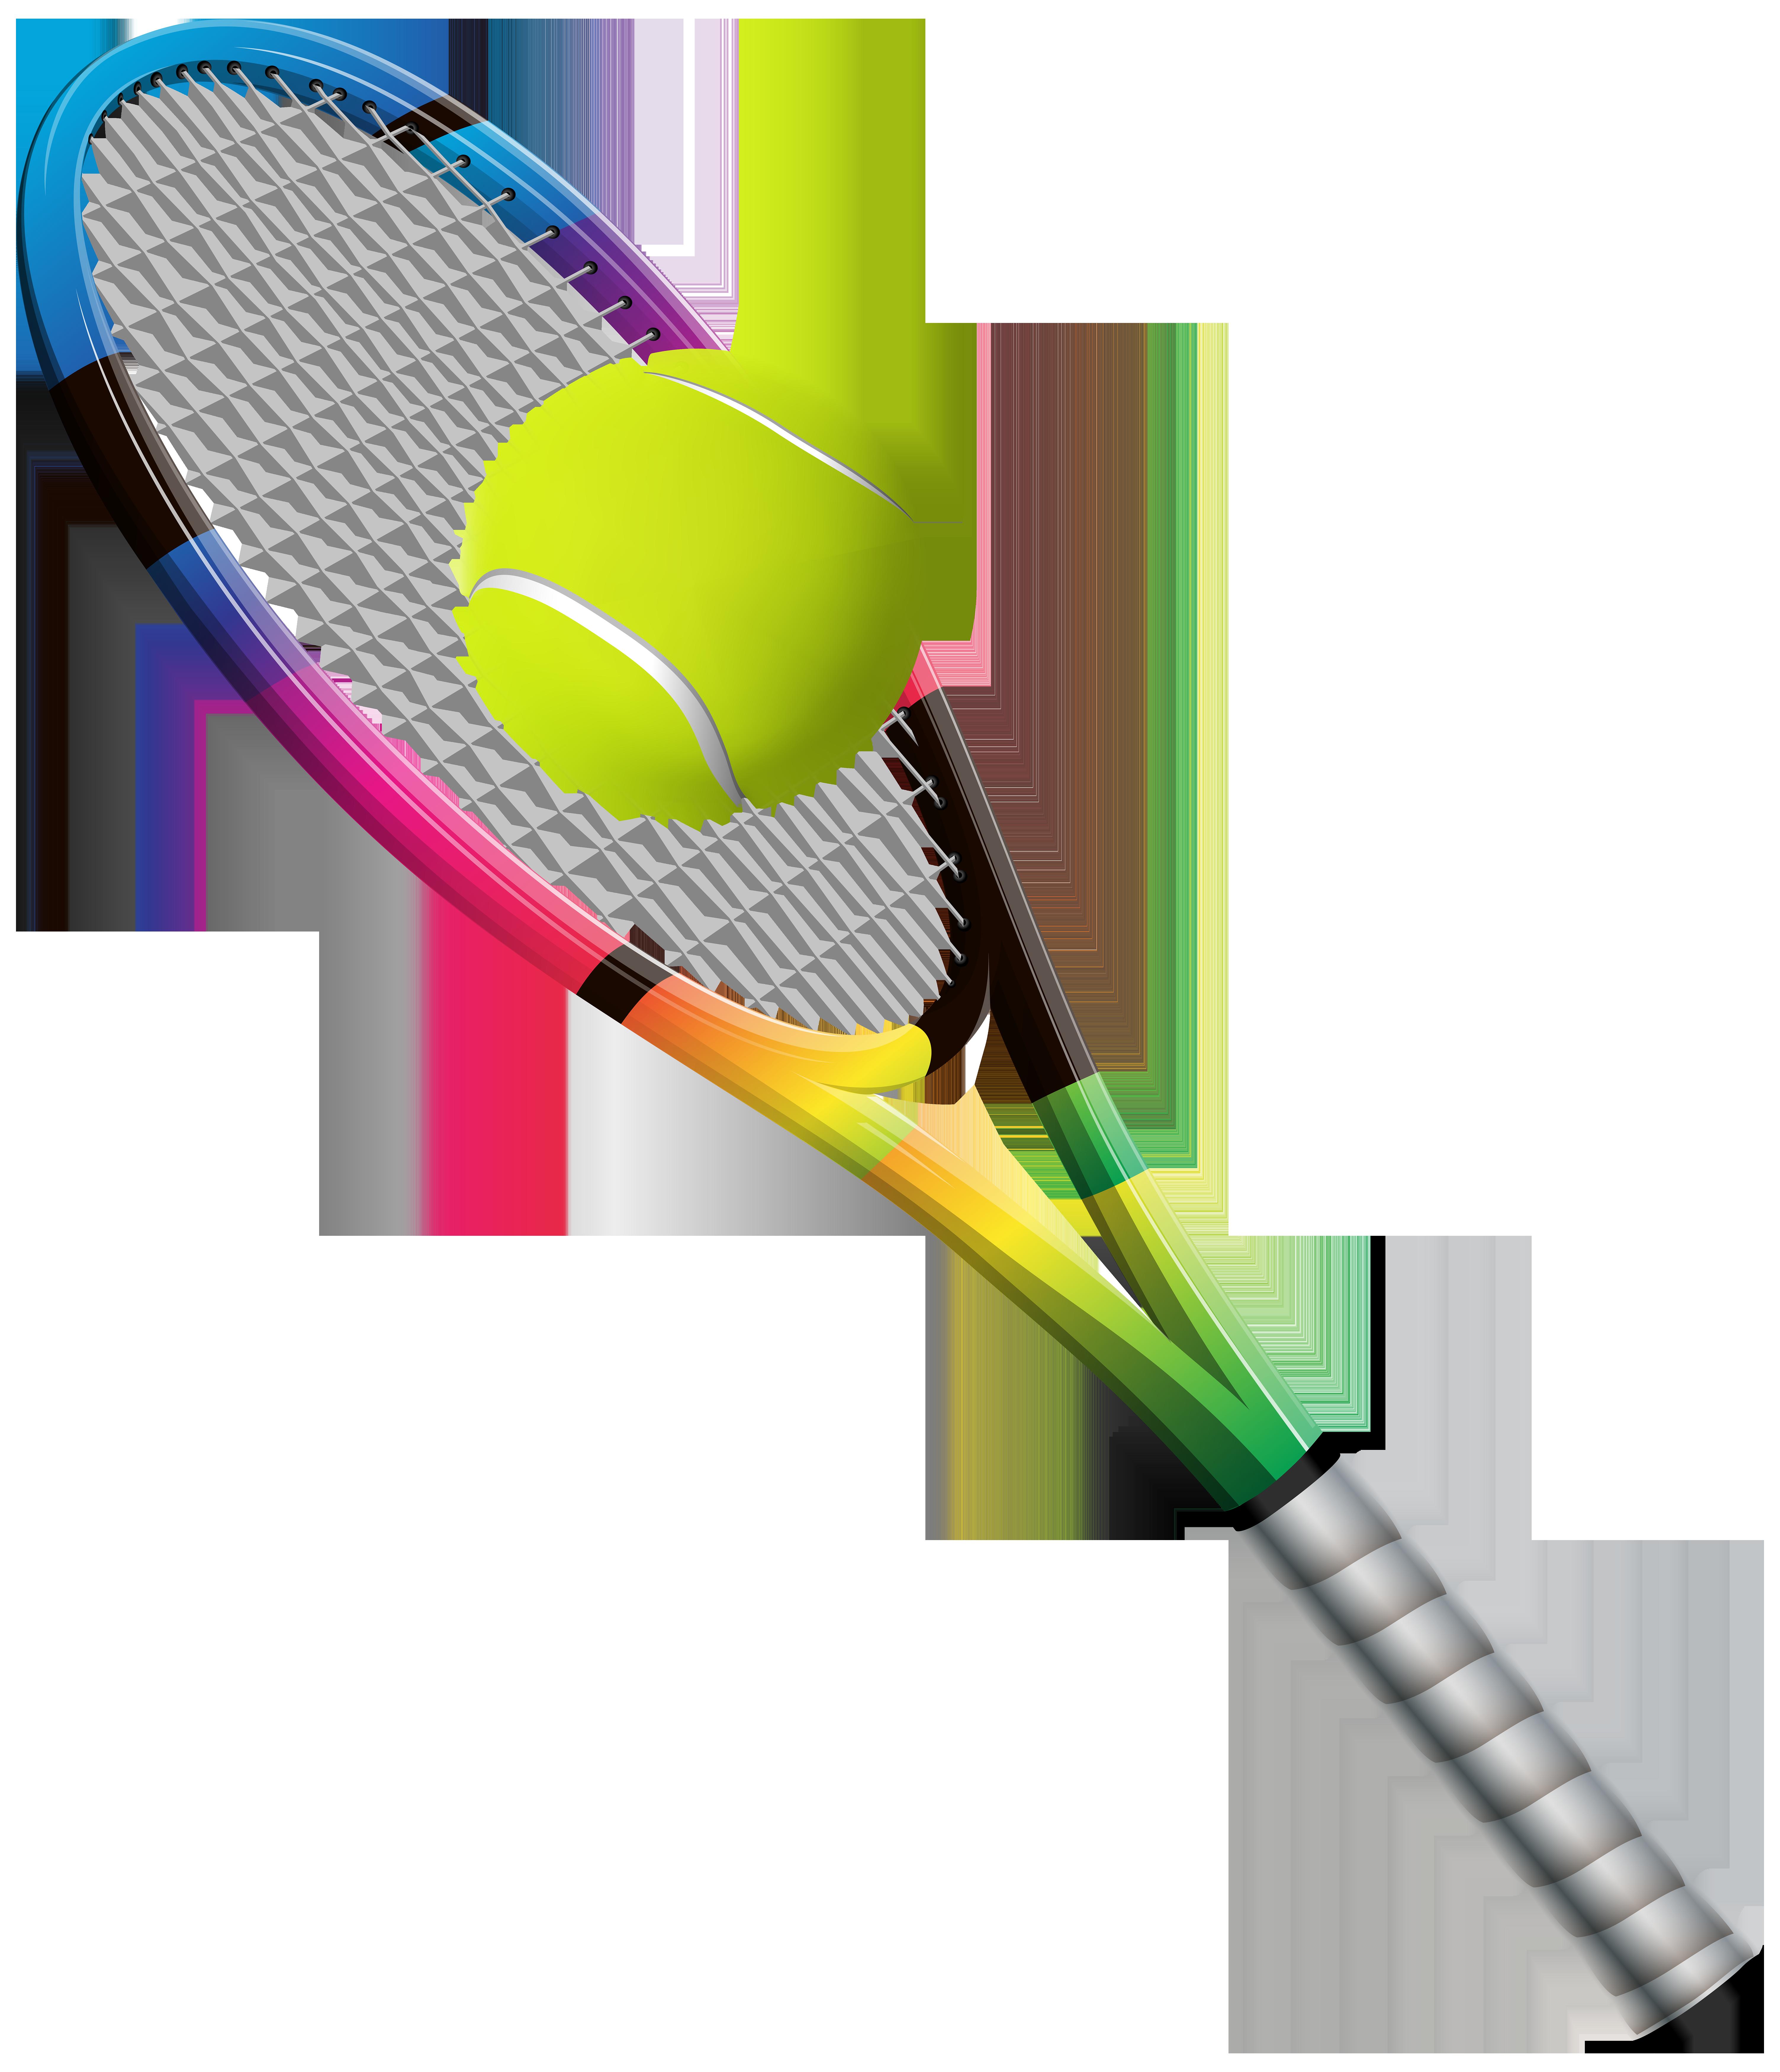 Tennis Racket and Ball Transparent PNG Clip Art Image.